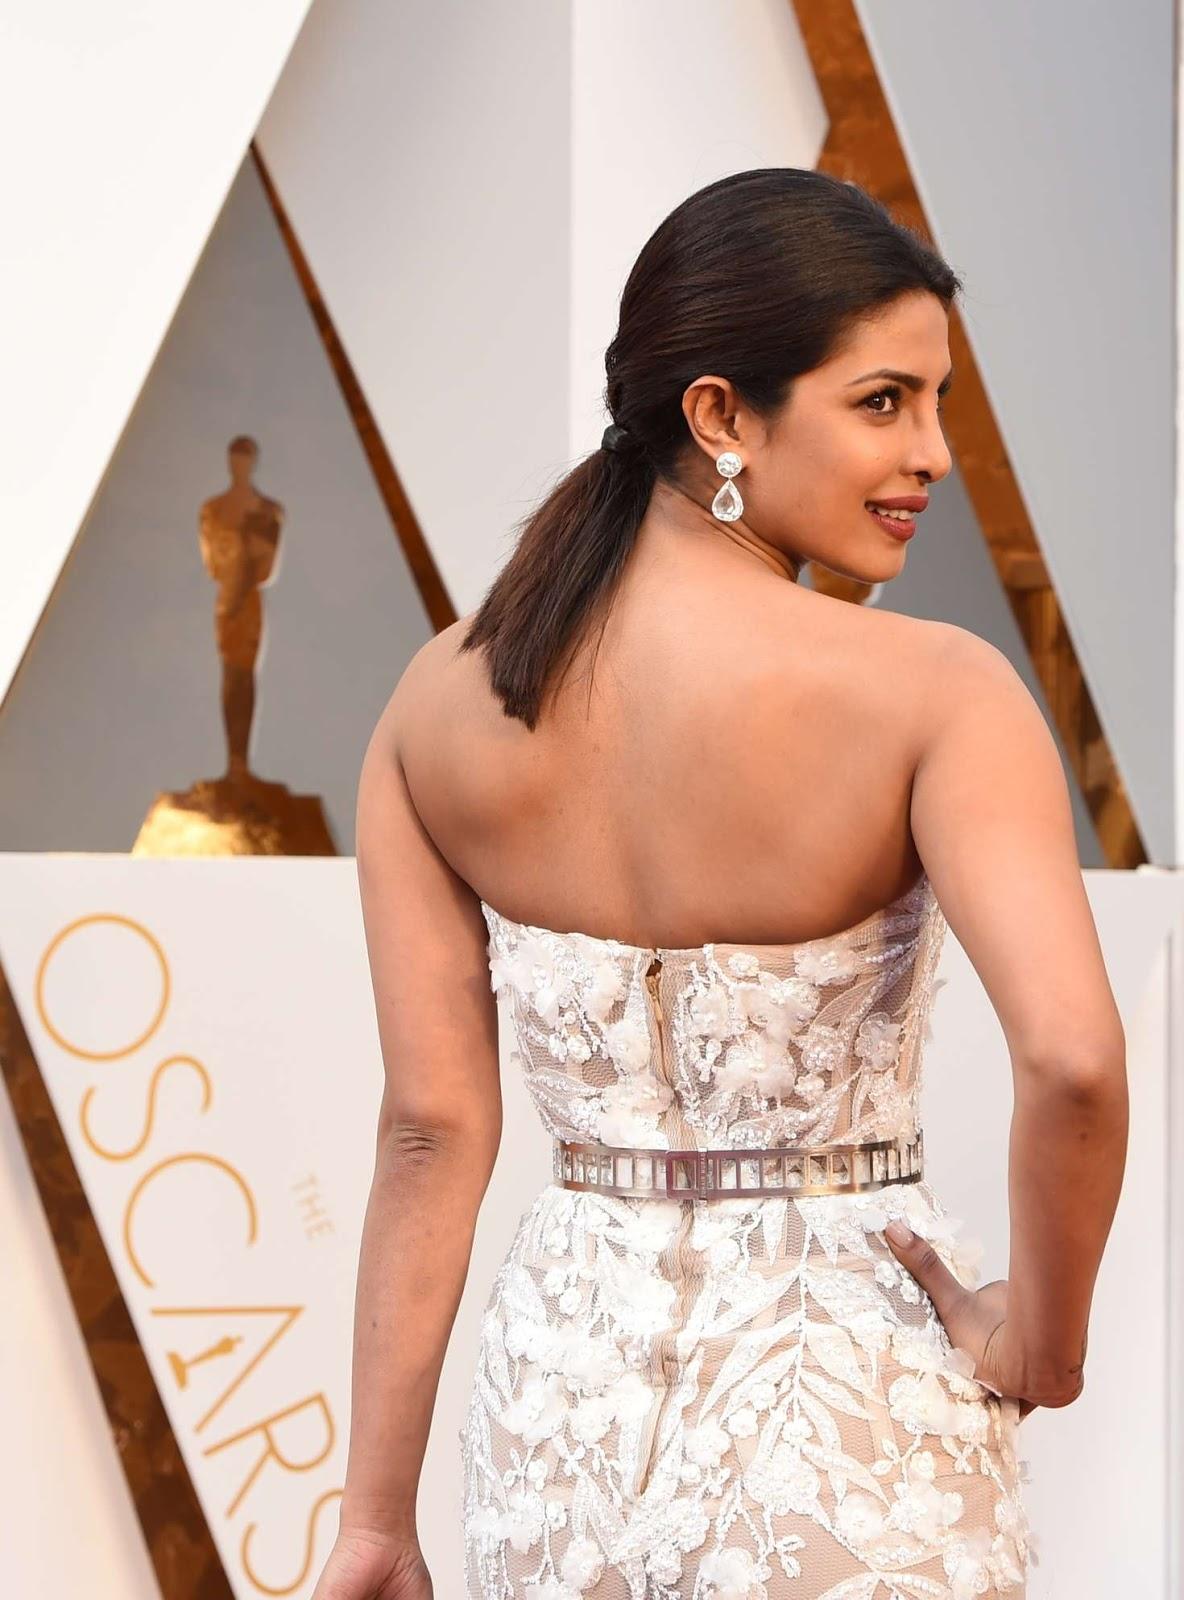 Priyanka Chopra Stunning Bold Dazzling White Gown at OSCARS 2016